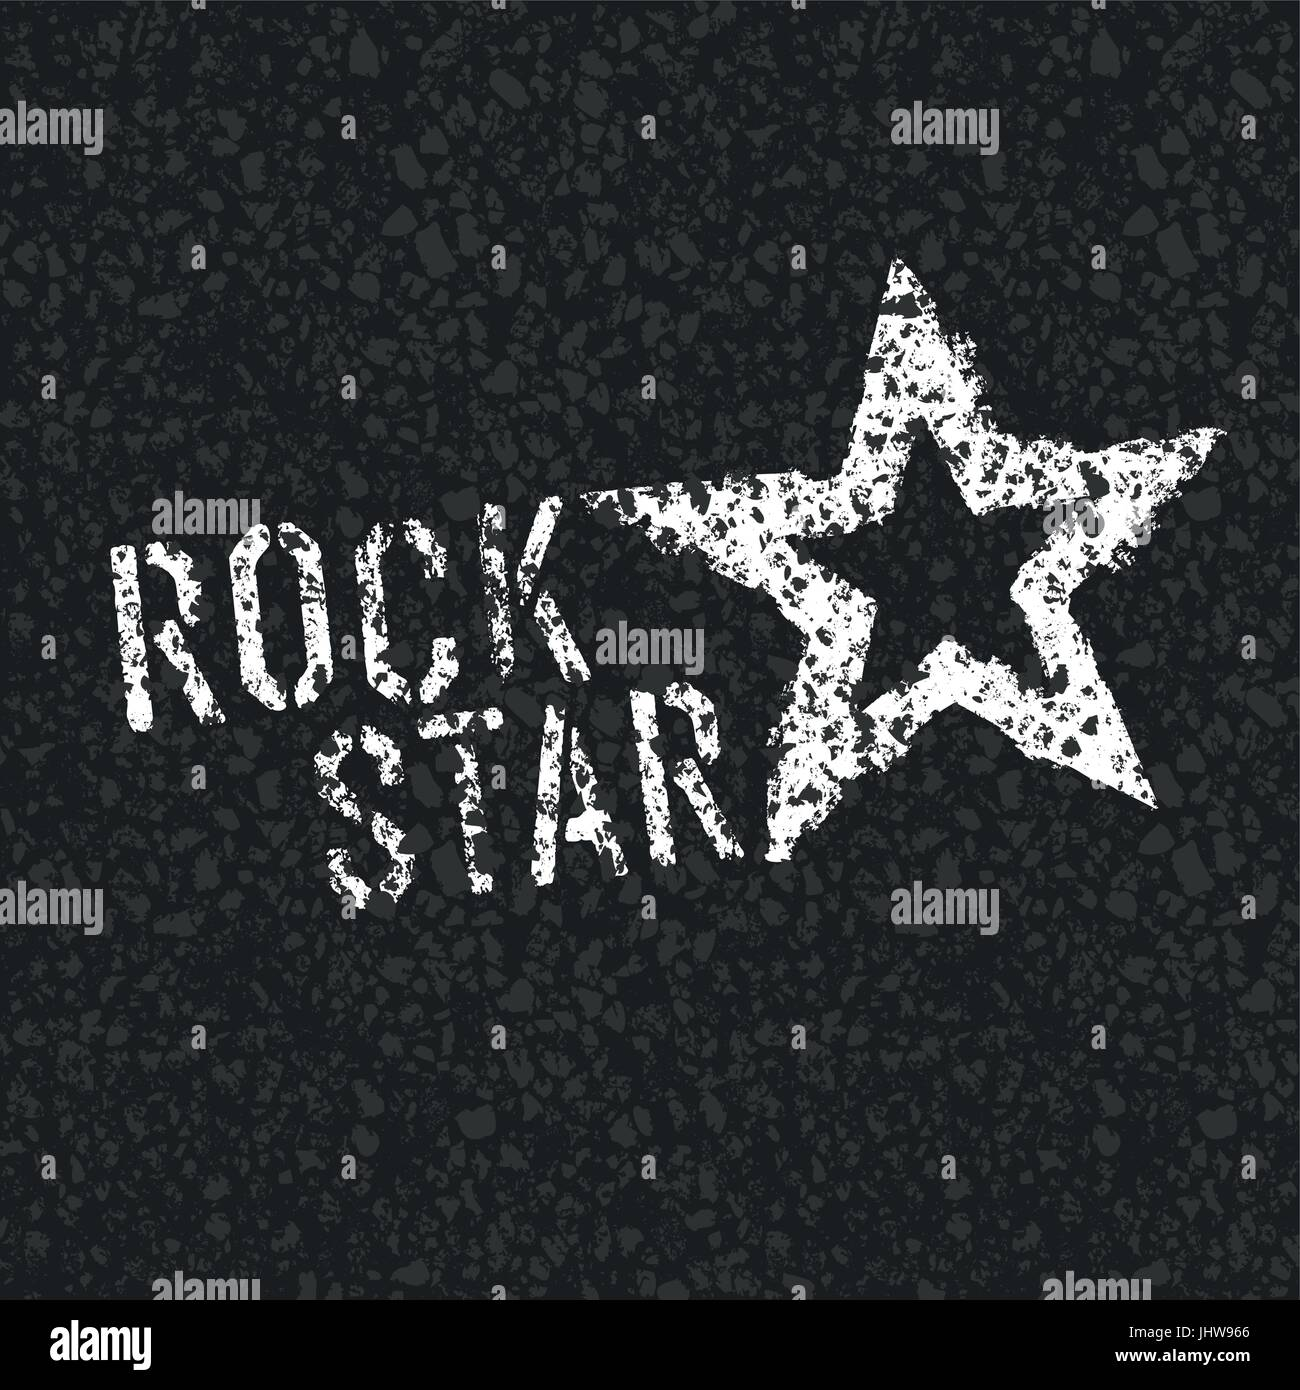 Rock Star Symbol On Asphalt Texture Stock Vector Art Illustration